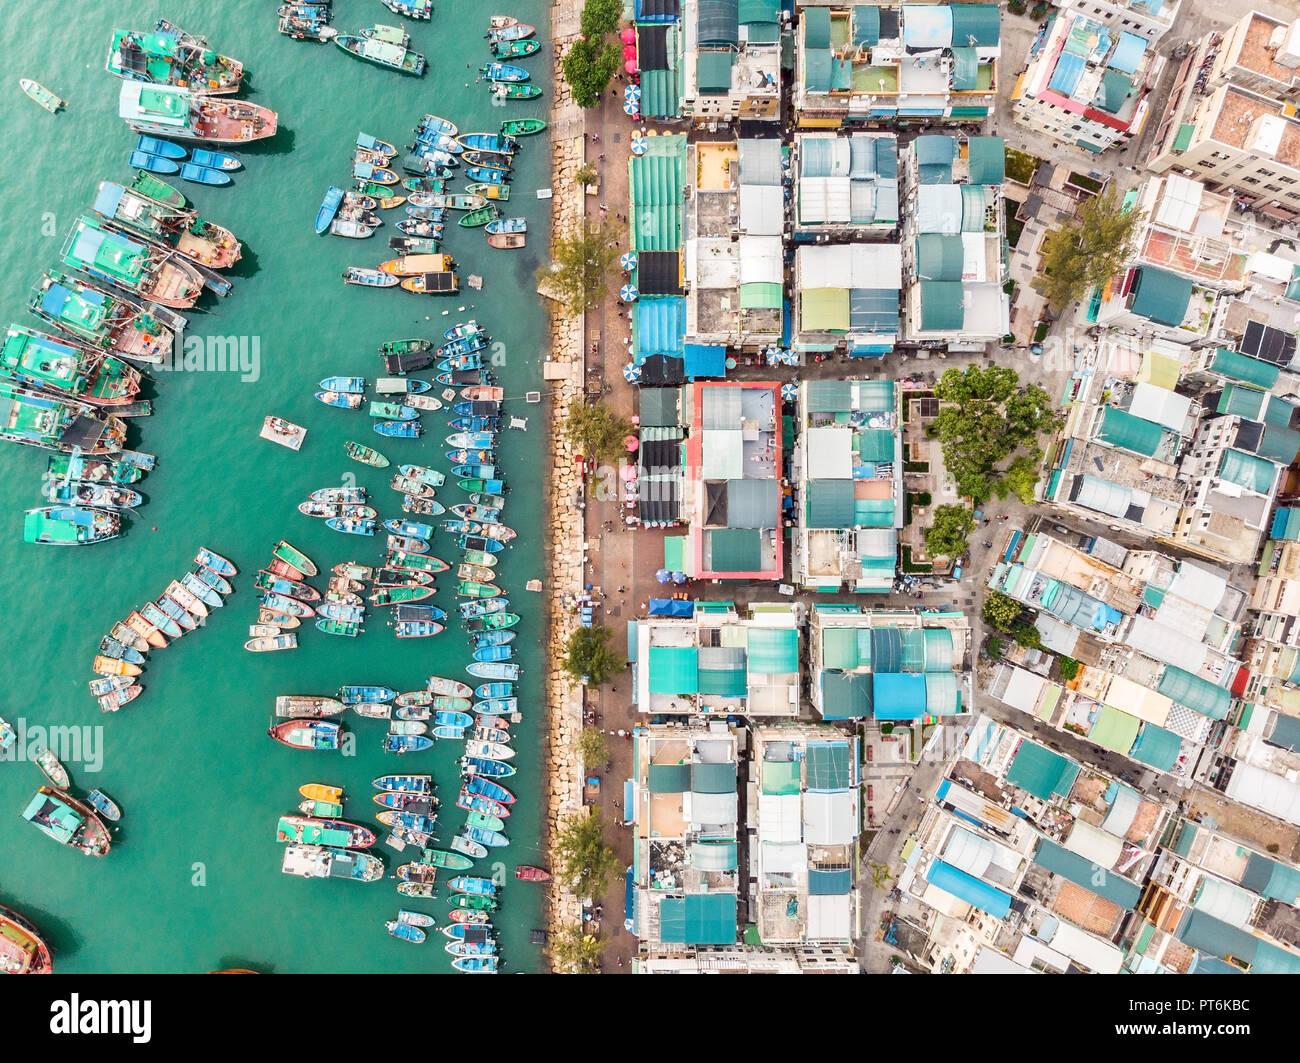 Cheung Chau Island Aerial Shot, Hong Kong Stock Photo